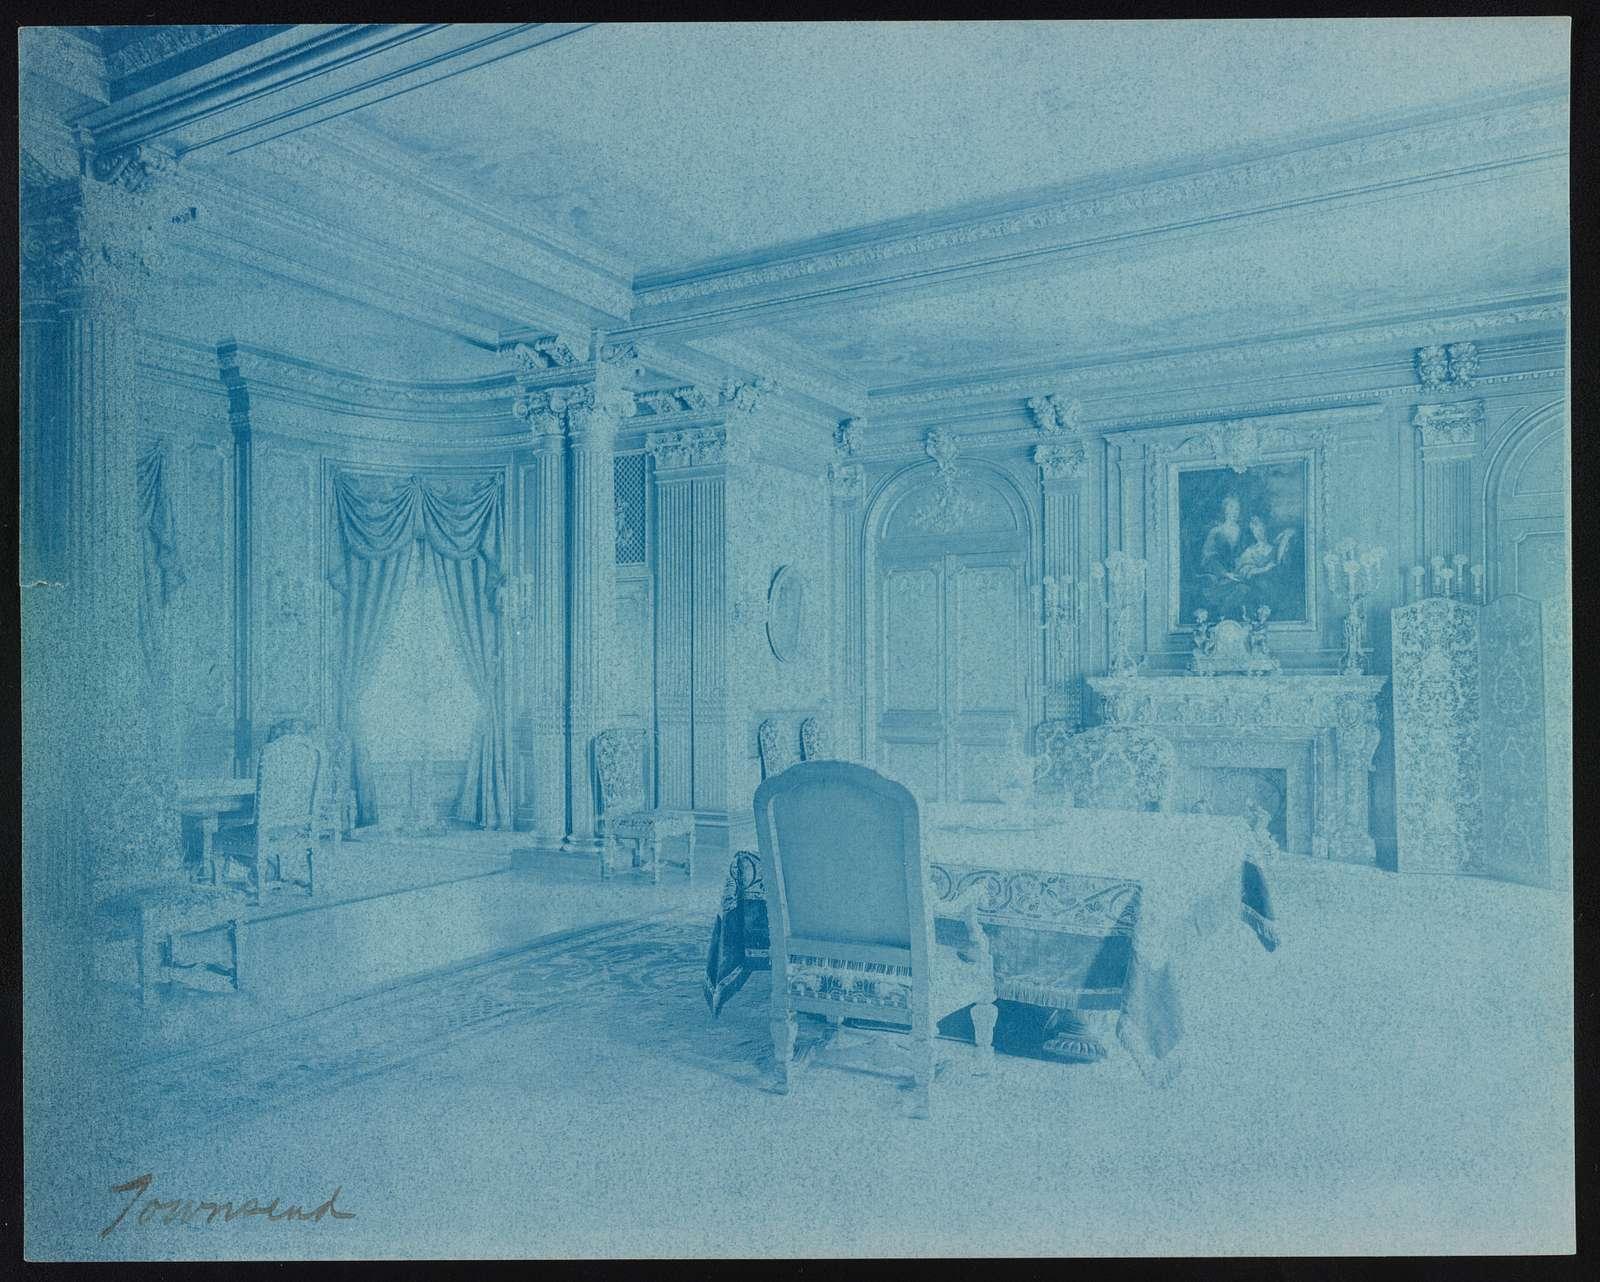 Mary Scott Townsend House, Washington, D.C.